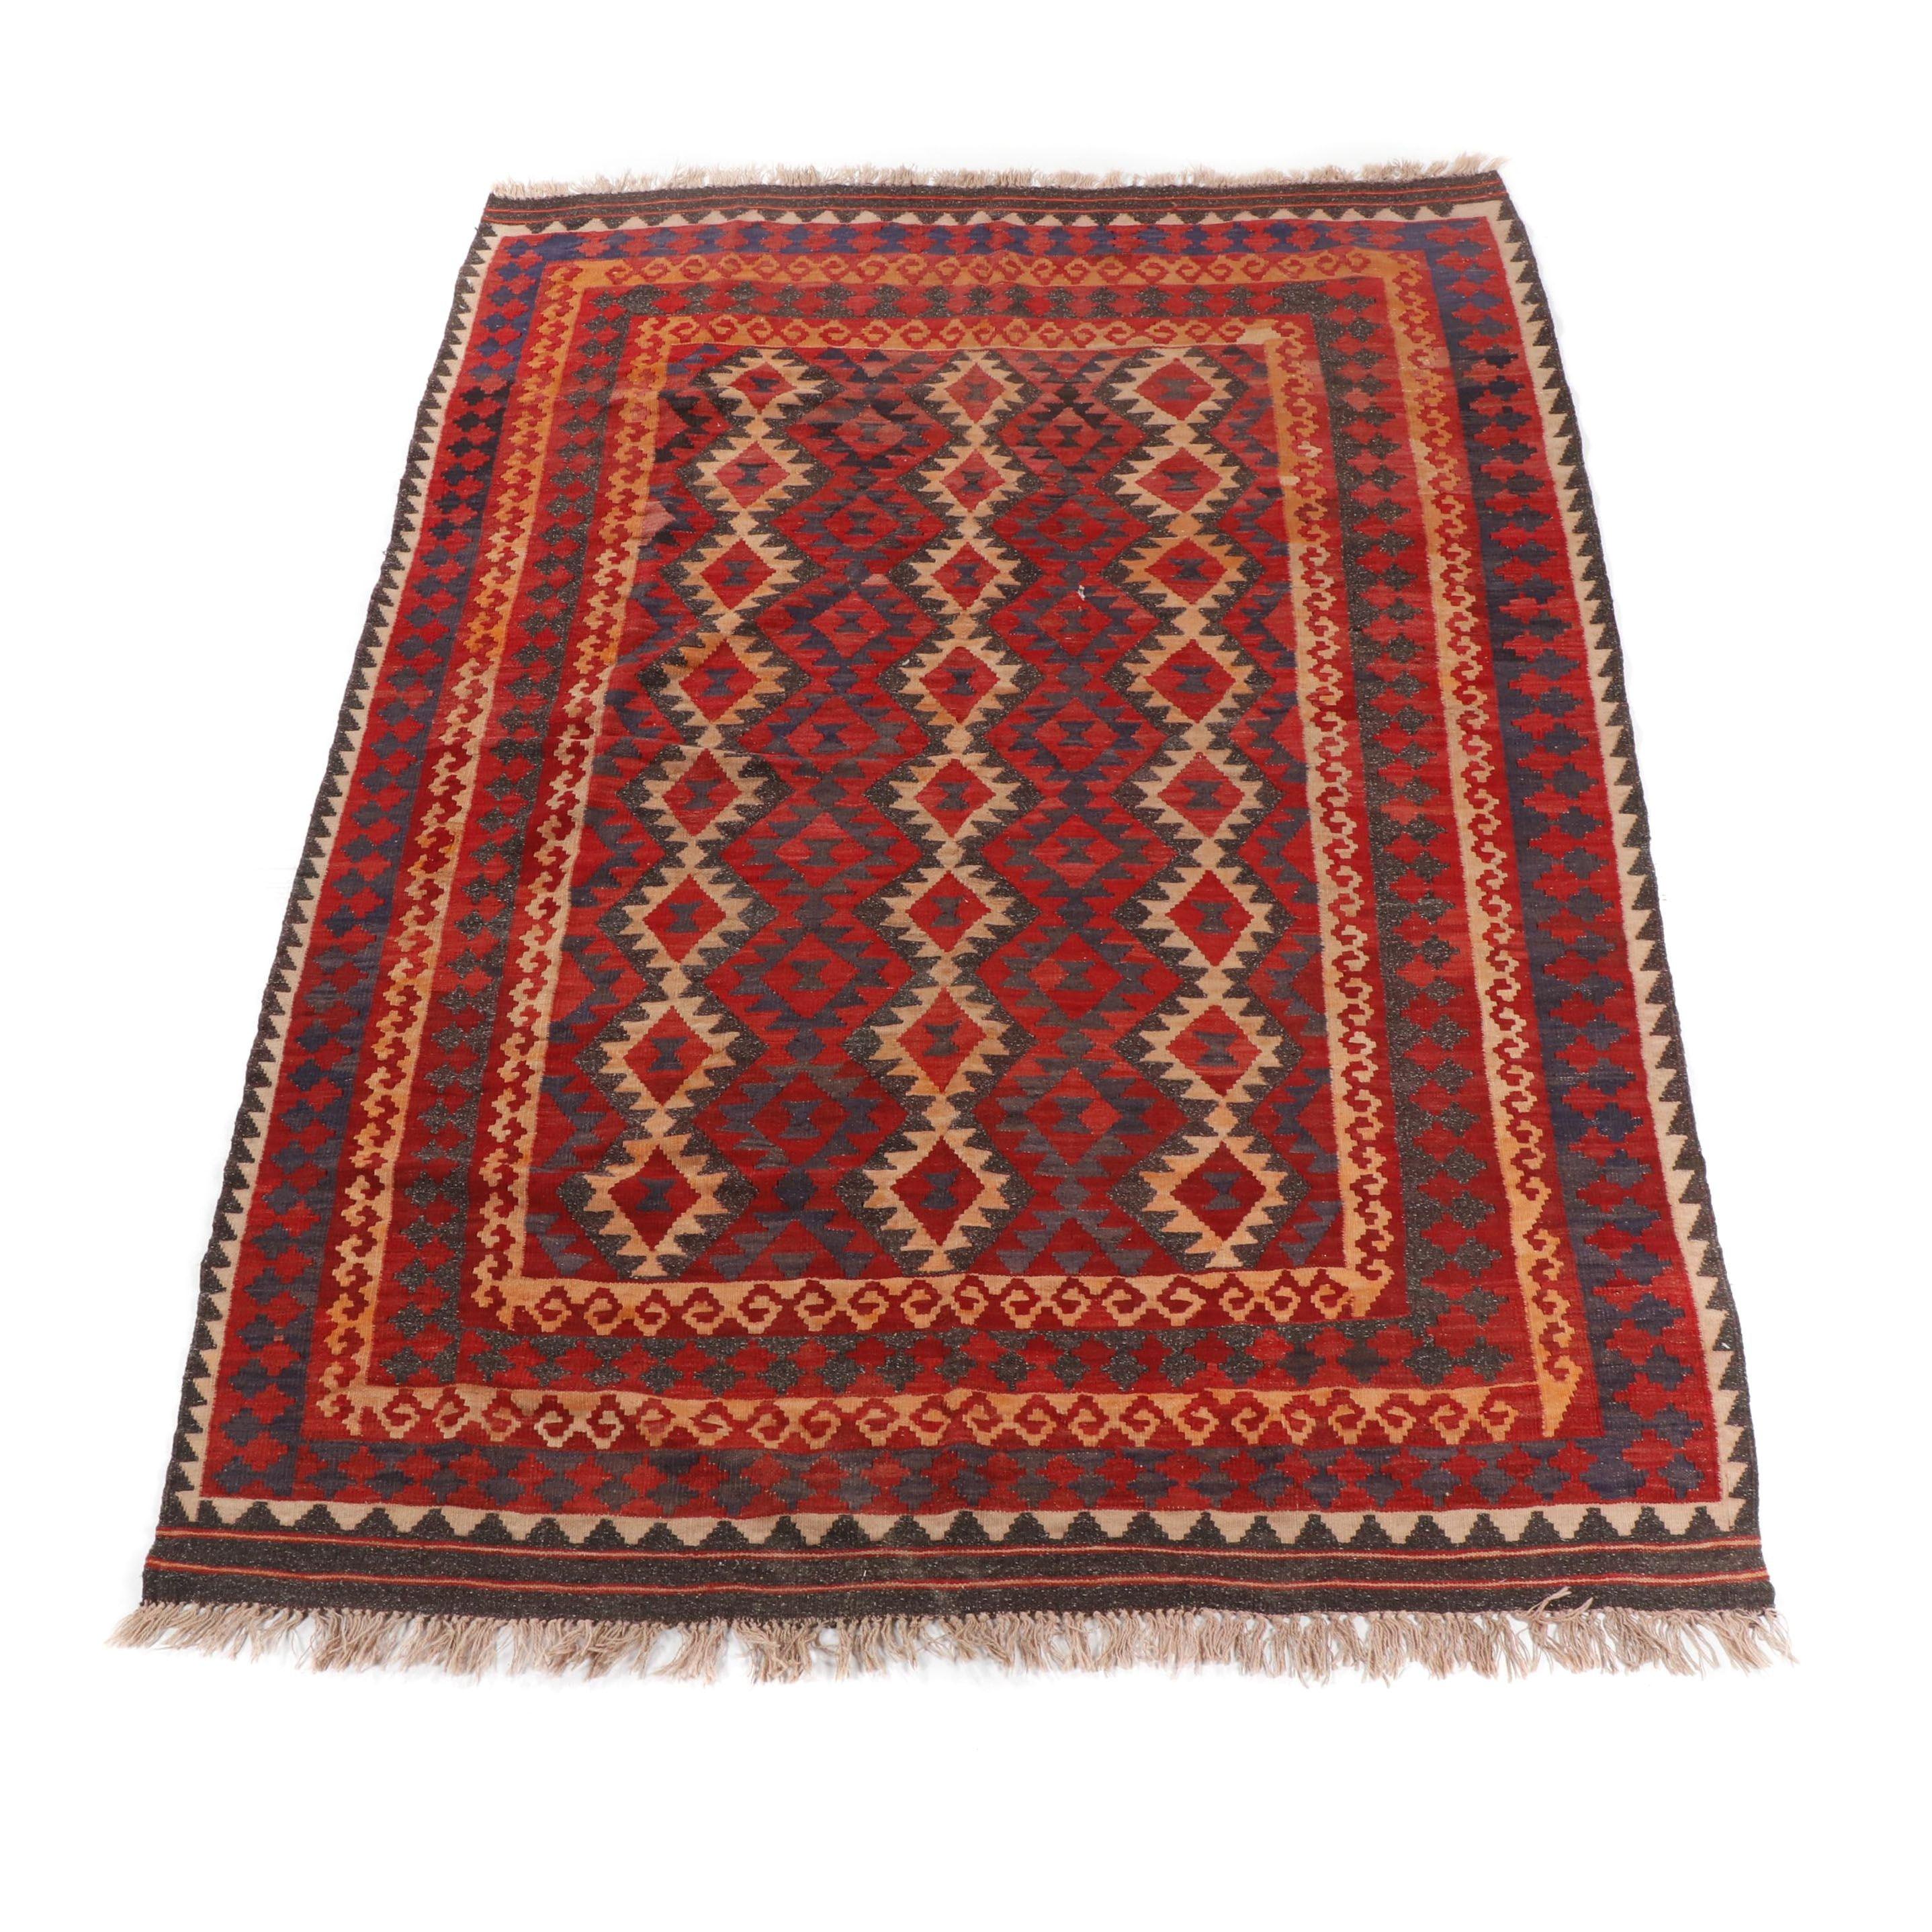 Hand-Knotted Afghani Kilim Wool Area Rug